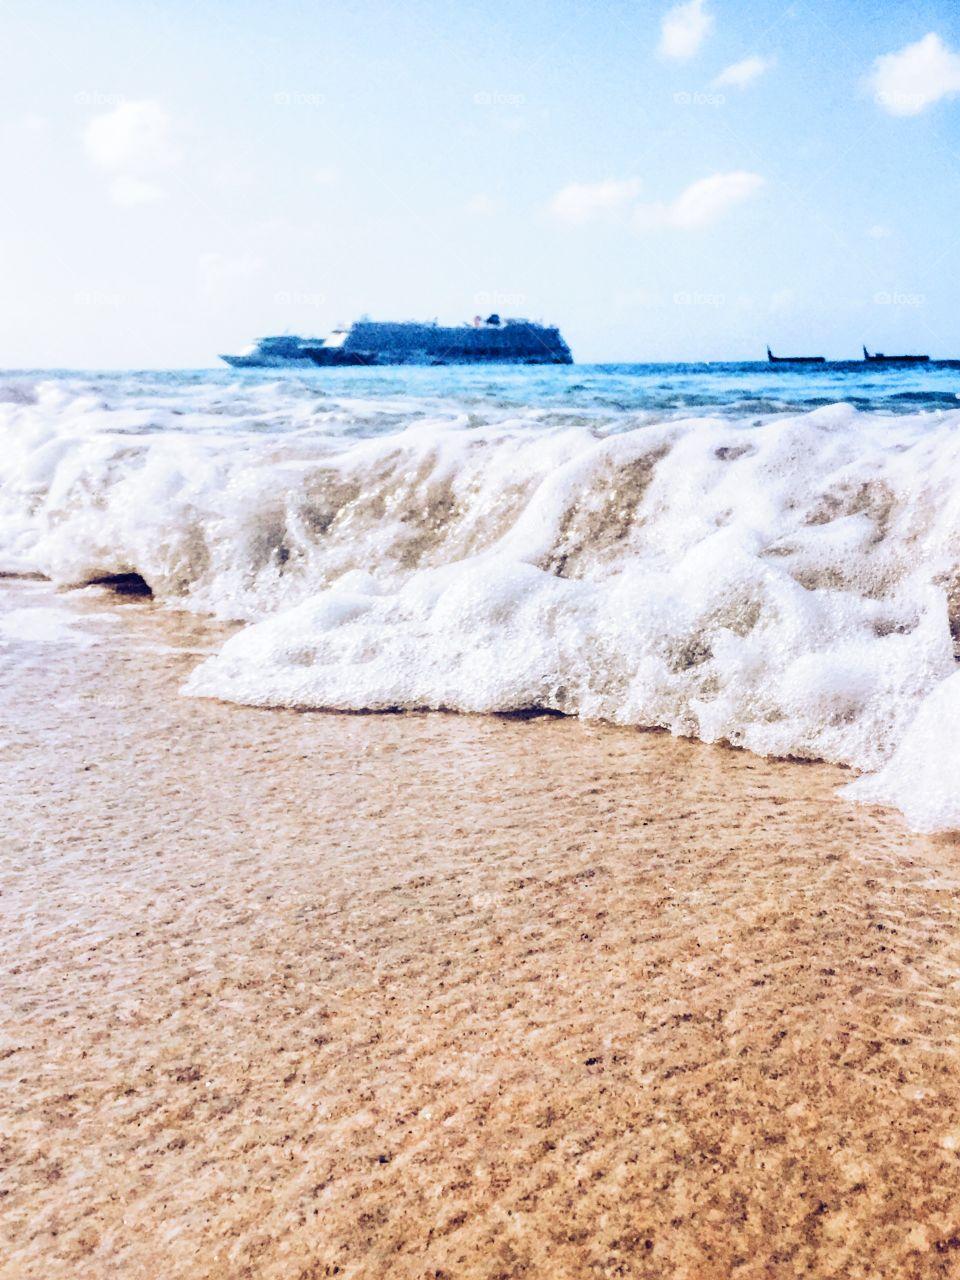 Sand, Beach, Seashore, Sea, Water